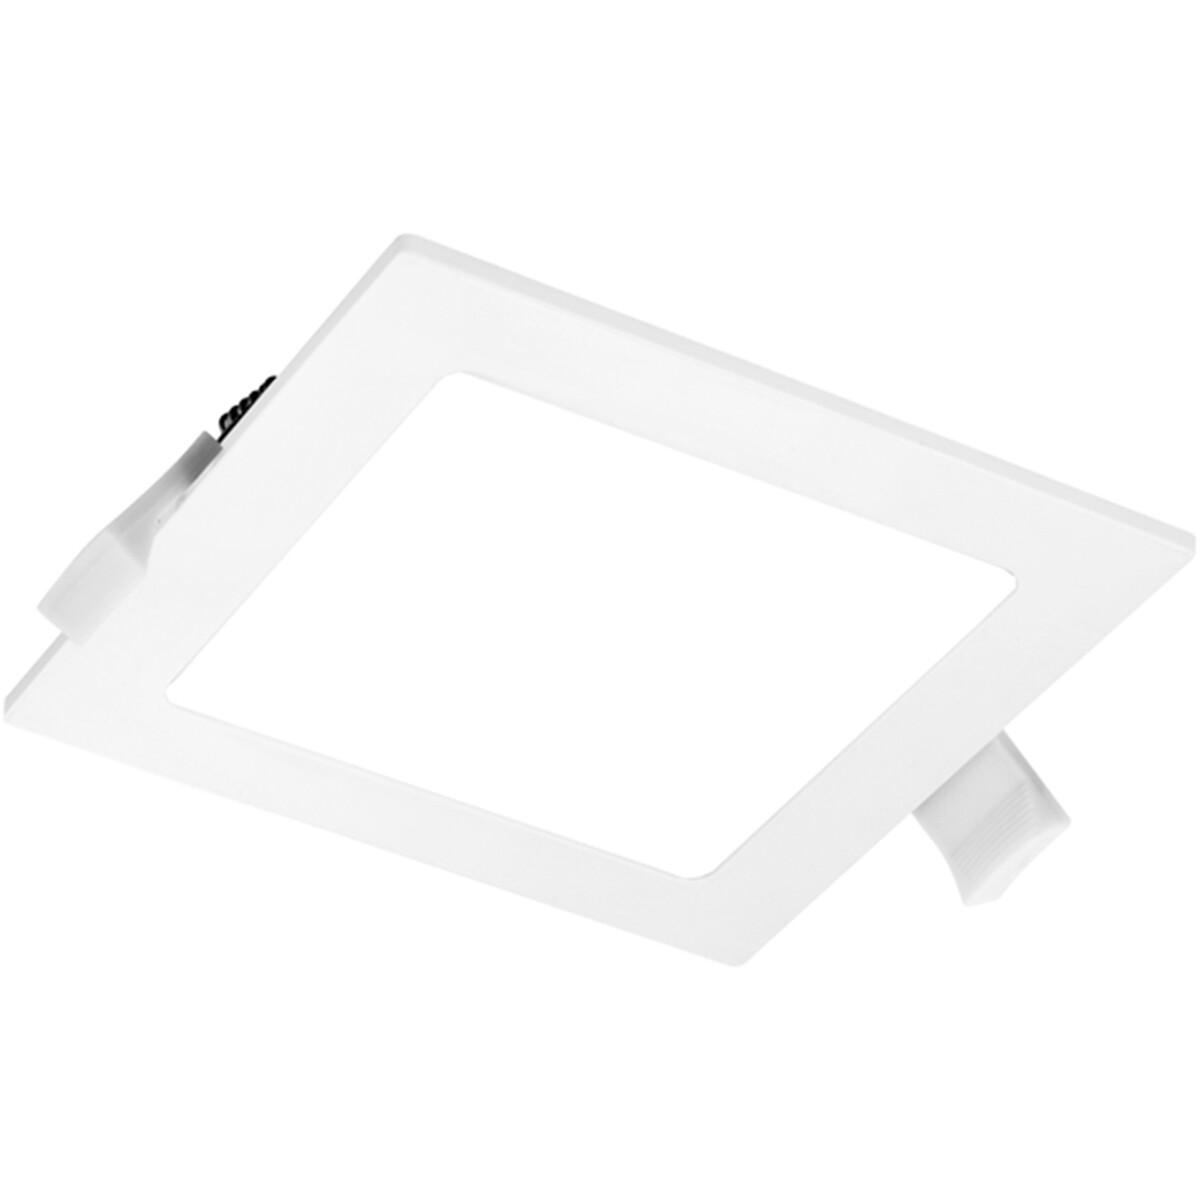 LED Downlight Slim Pro - Aigi Suno - Inbouw Vierkant 6W - Helder/Koud Wit 6000K - Mat Wit - Kunststo